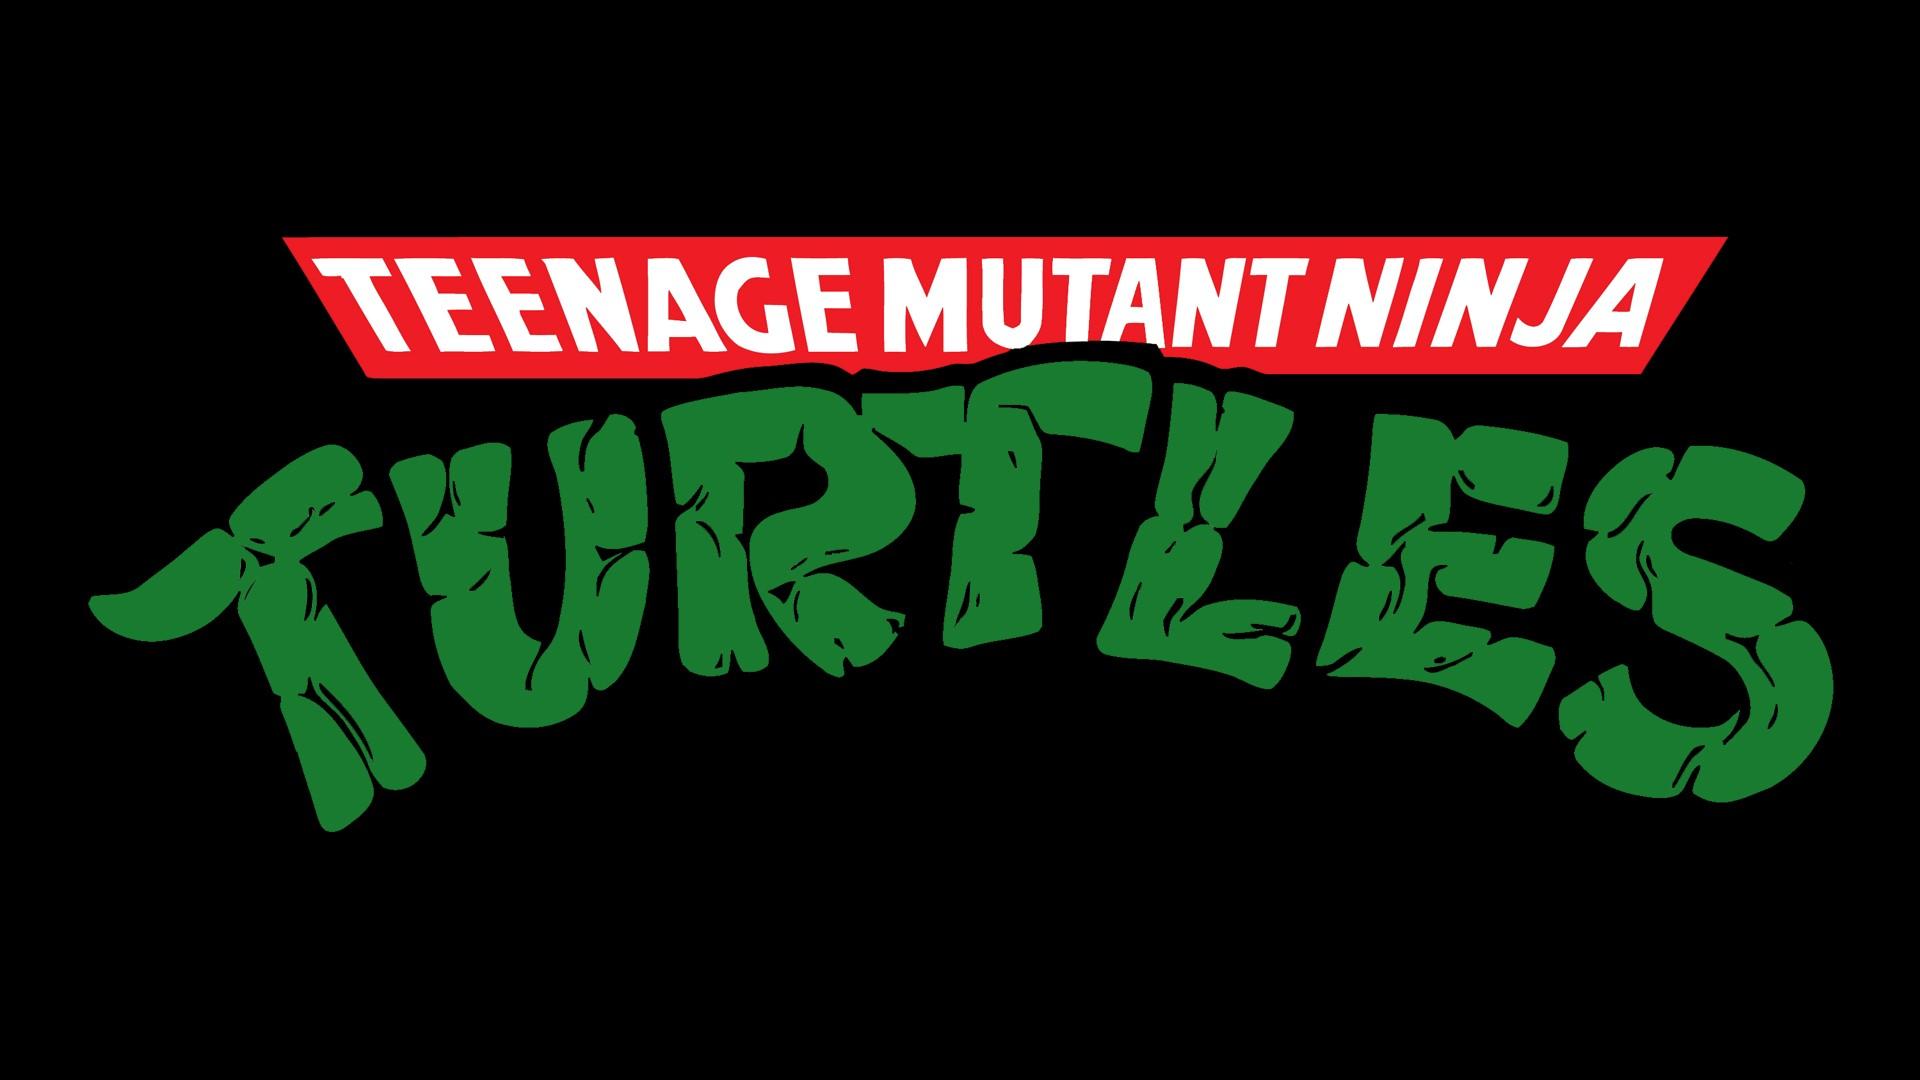 Teenage Mutant Ninja Turtles Wallpaper Download Free Cool